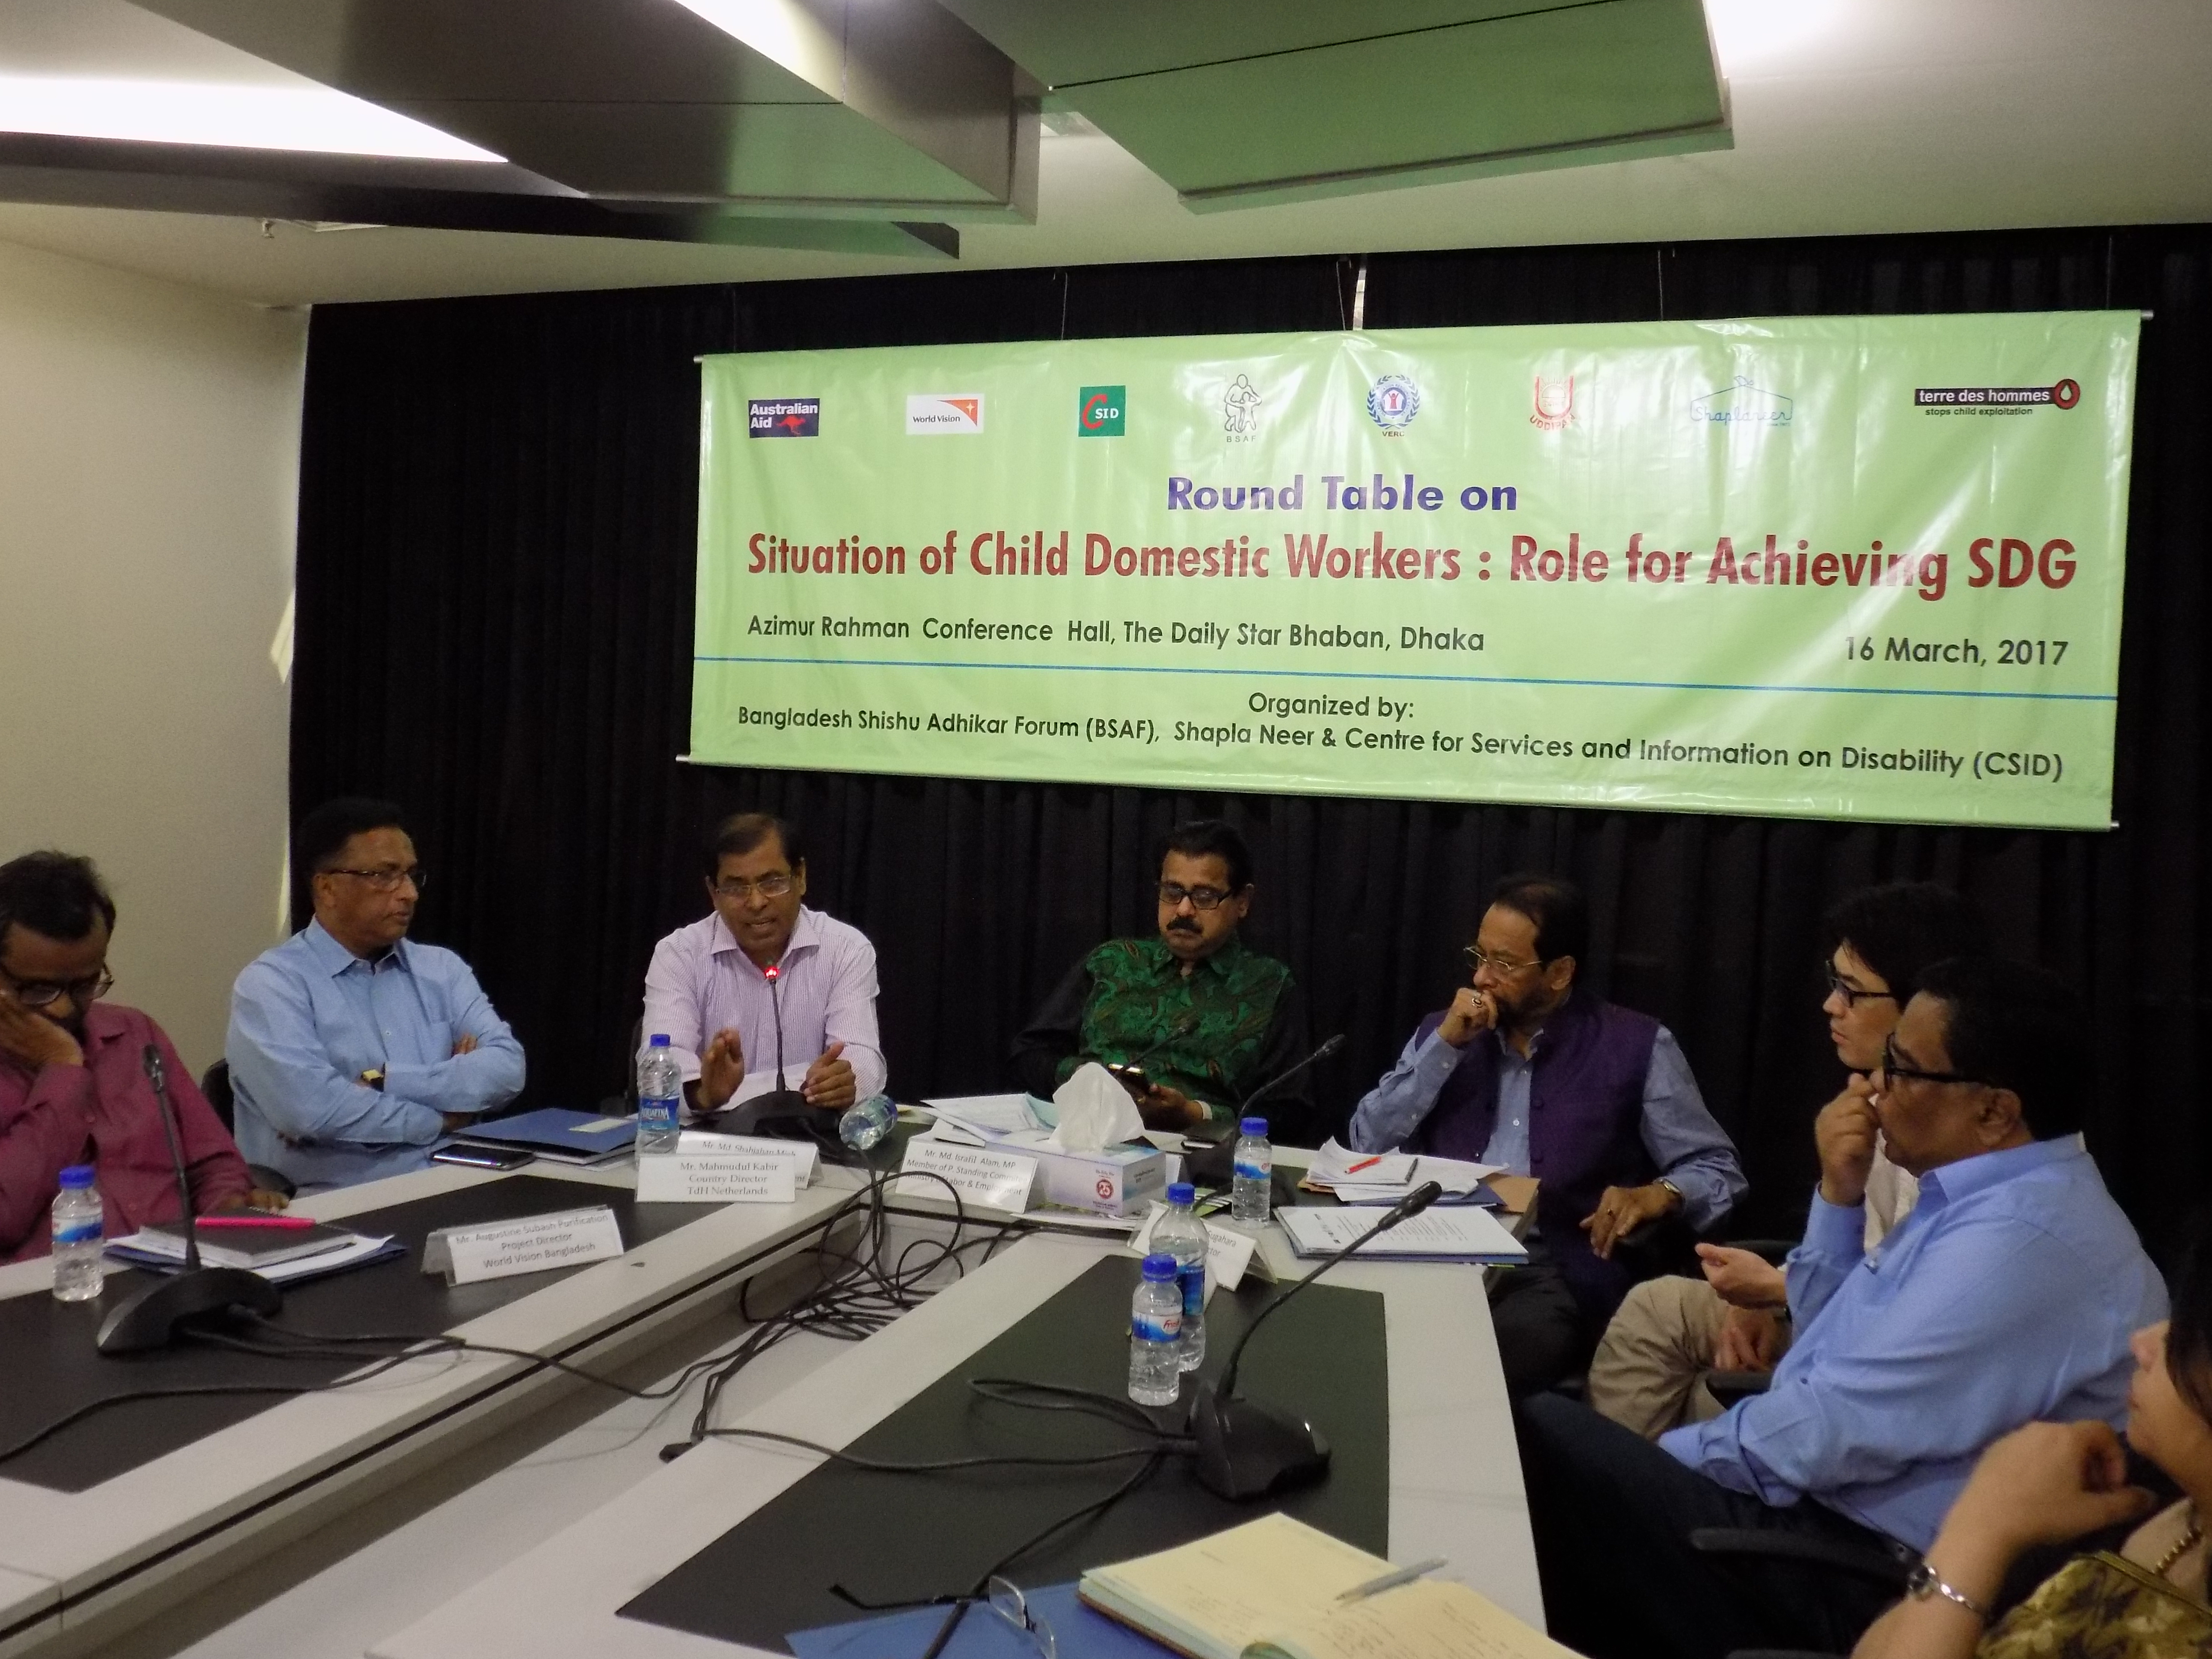 Bangladesh Shishu Adhikar Forum (BSAF) – A Nationwide